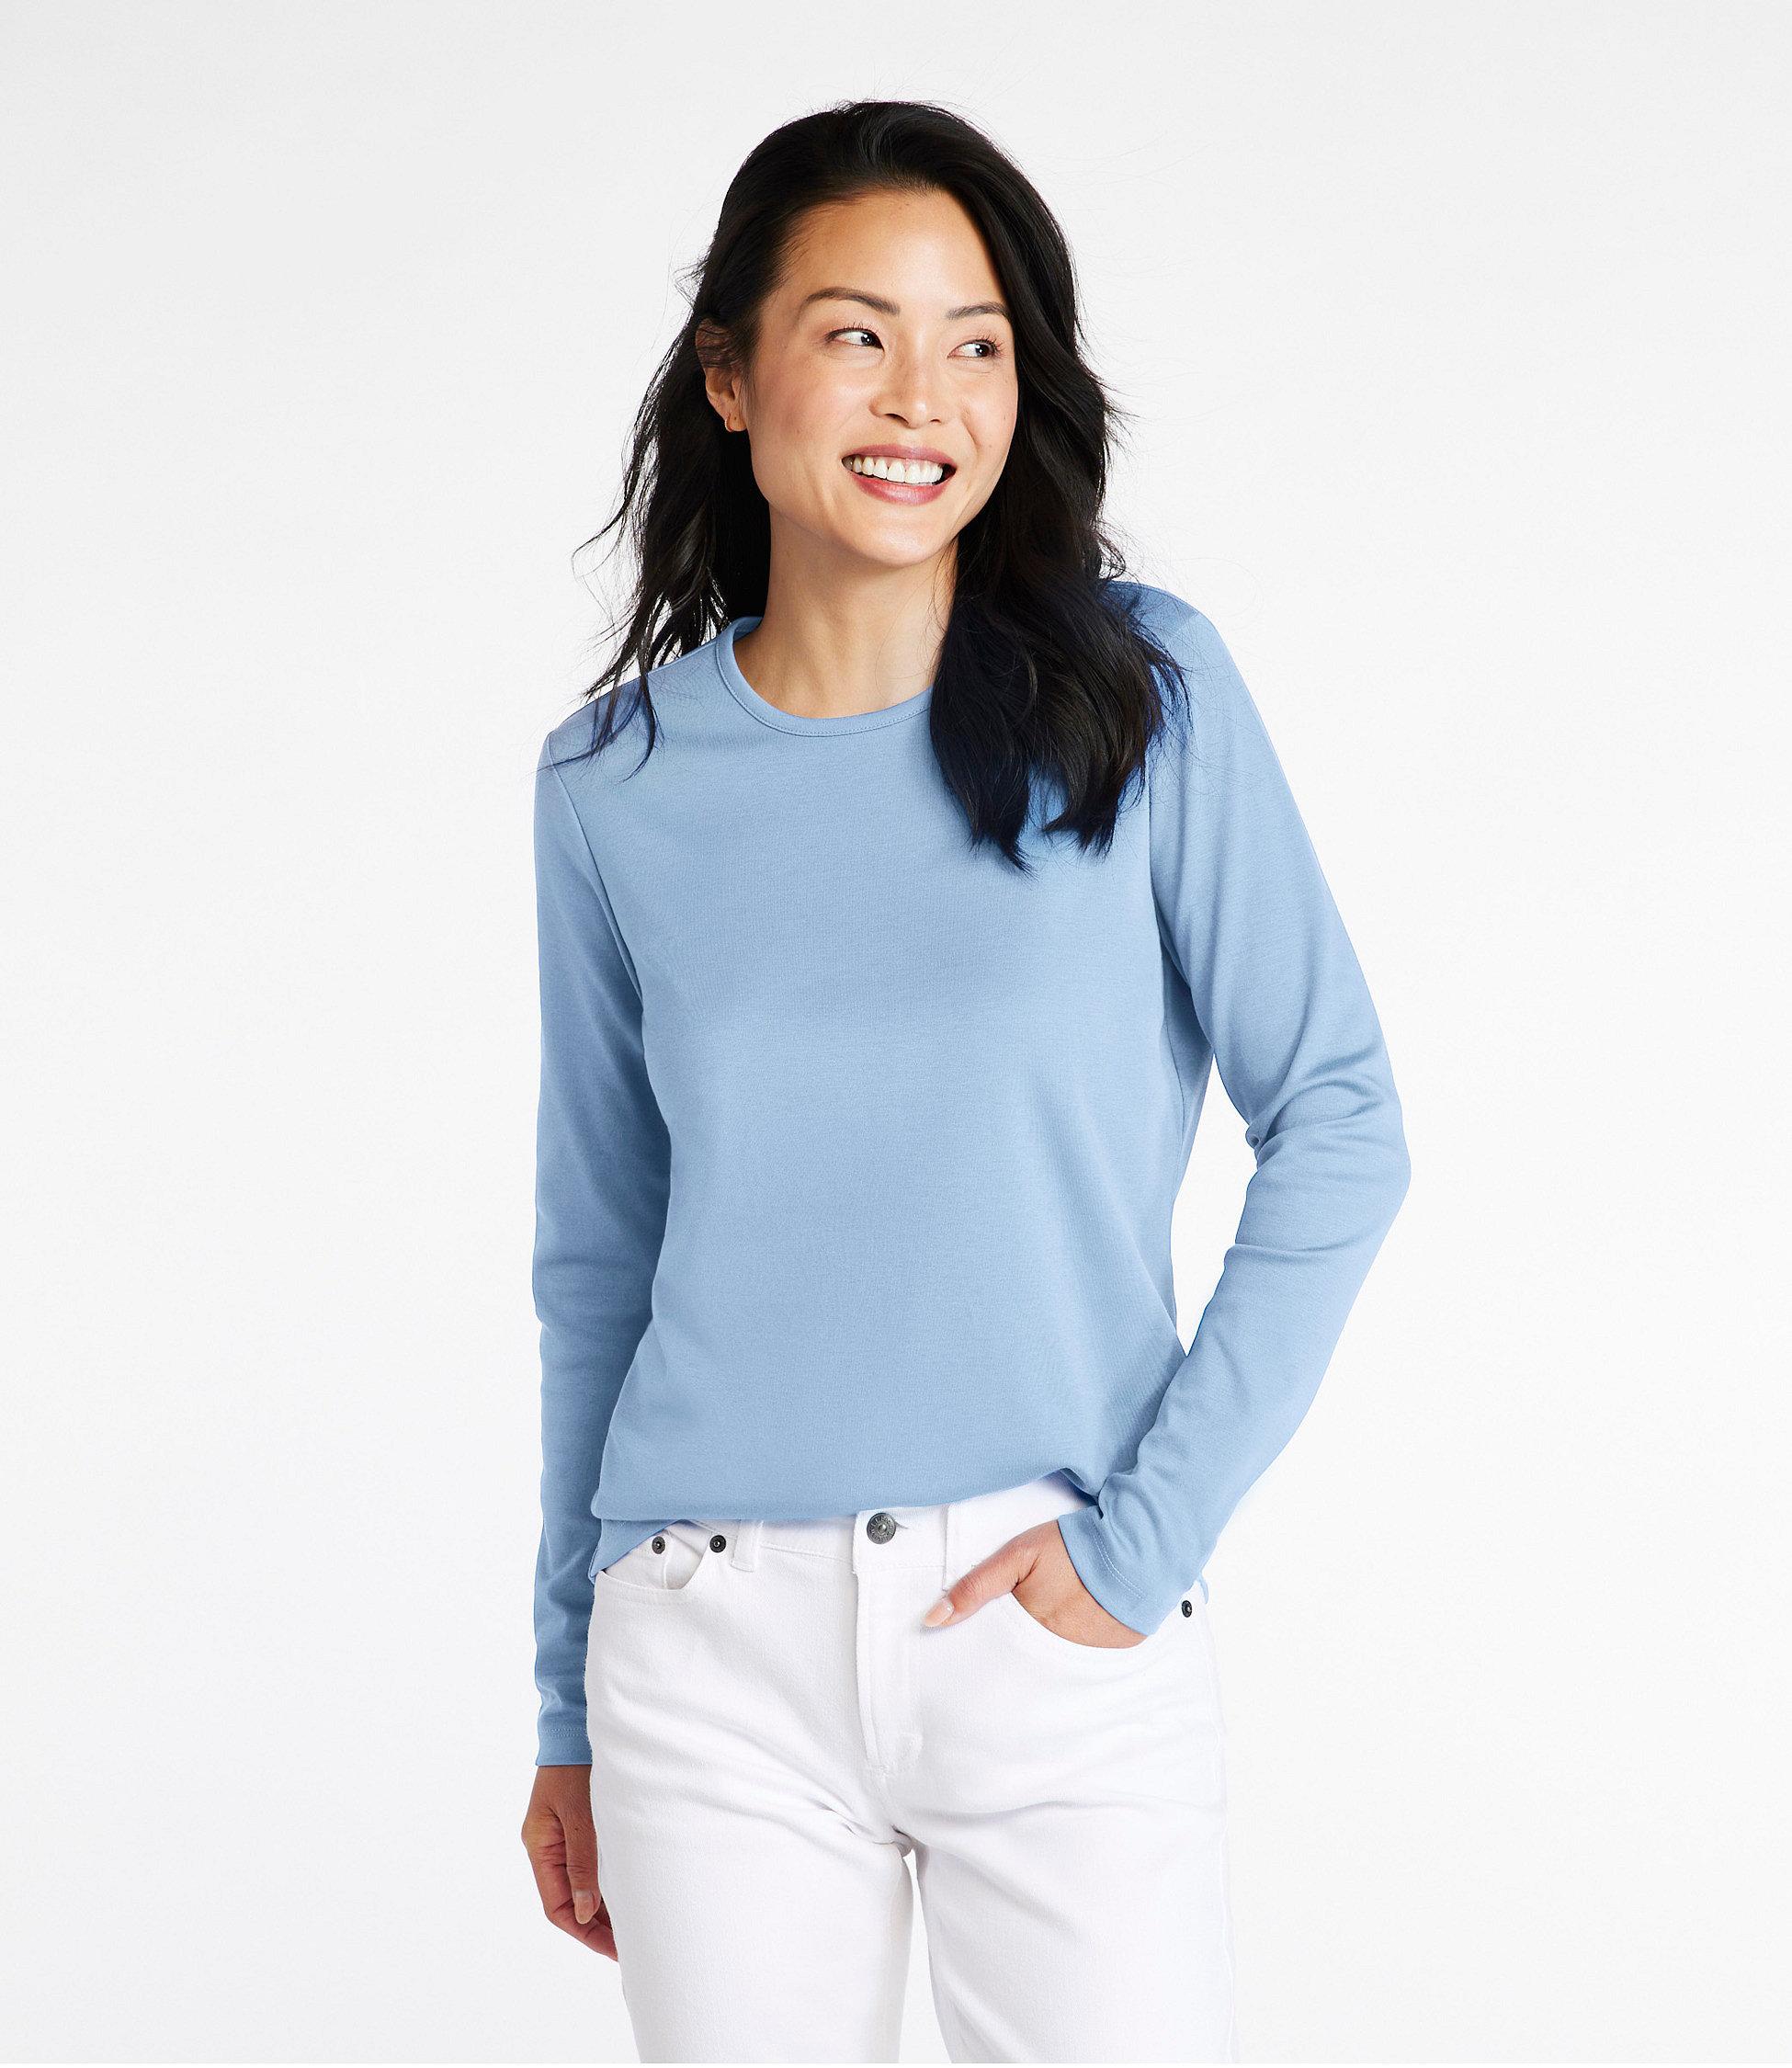 Women's Pima Cotton Tee, Long-Sleeve Crewneck | Free Shipping at ...